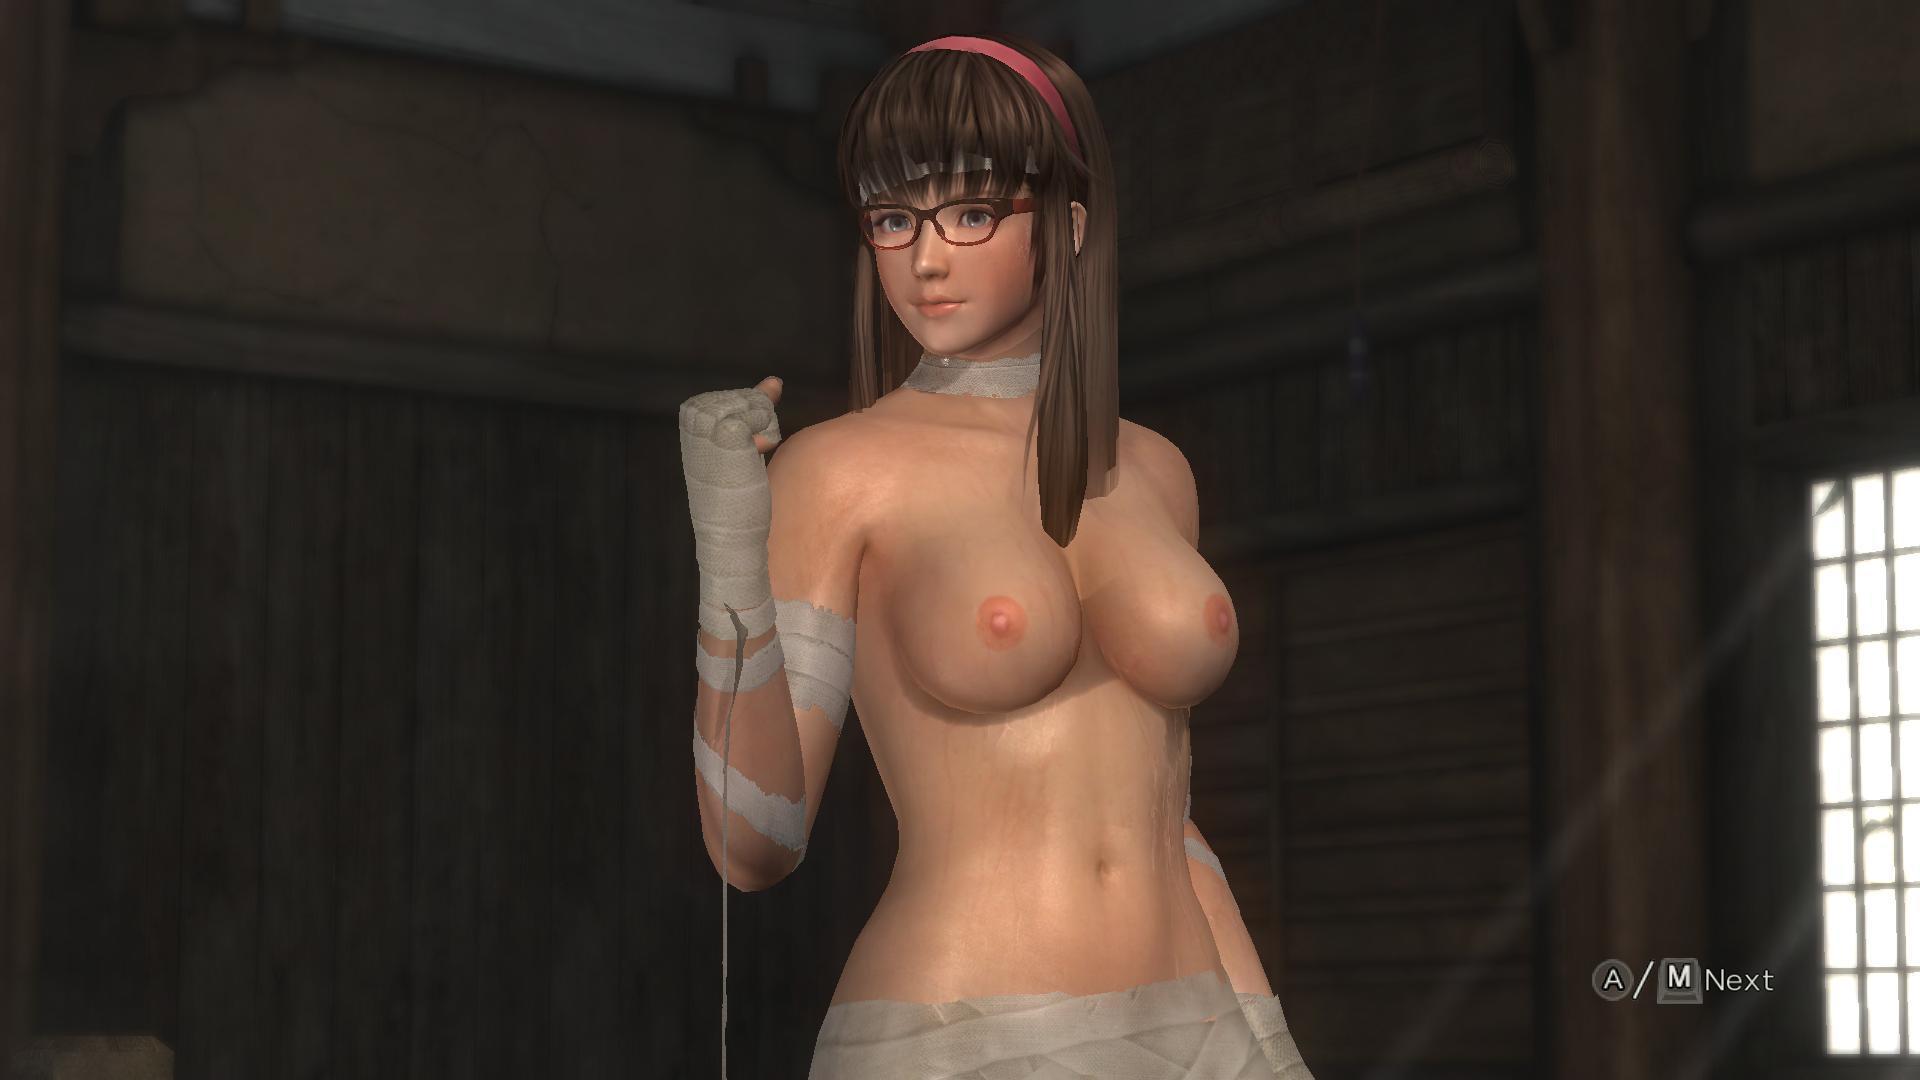 Nude game vixens